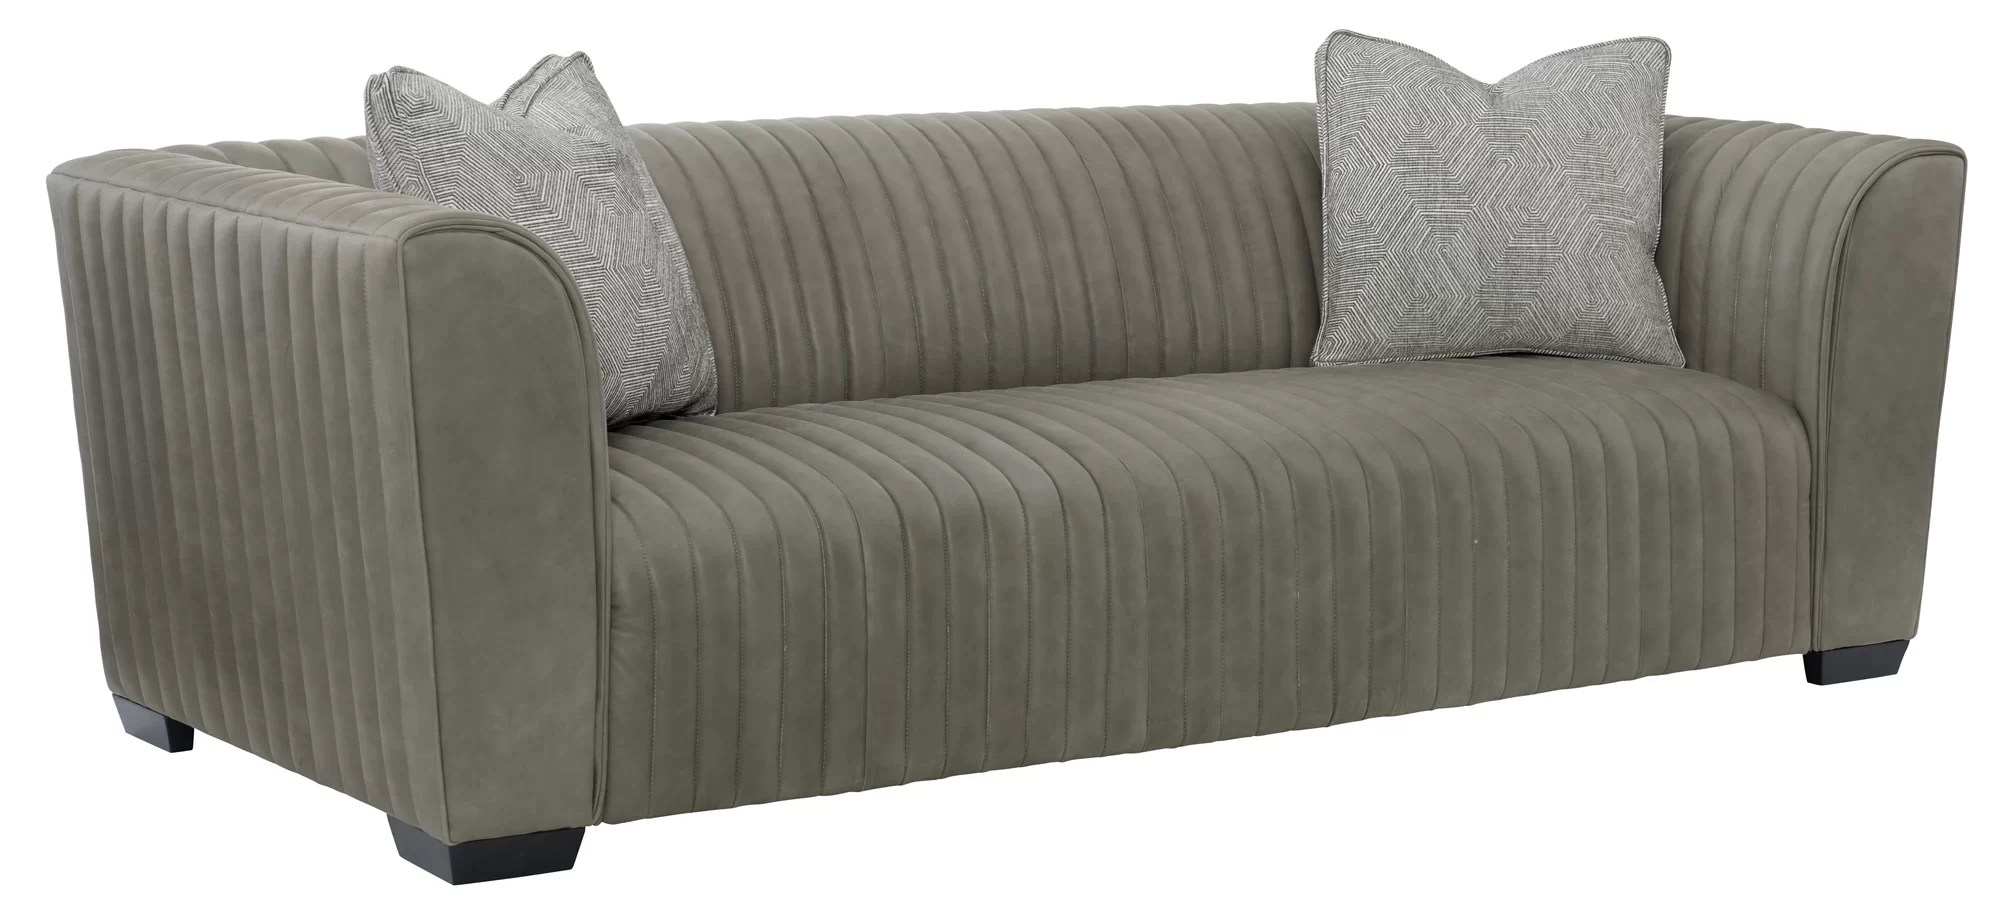 sofa upholstery kent large over mirrors bernhardt wayfair